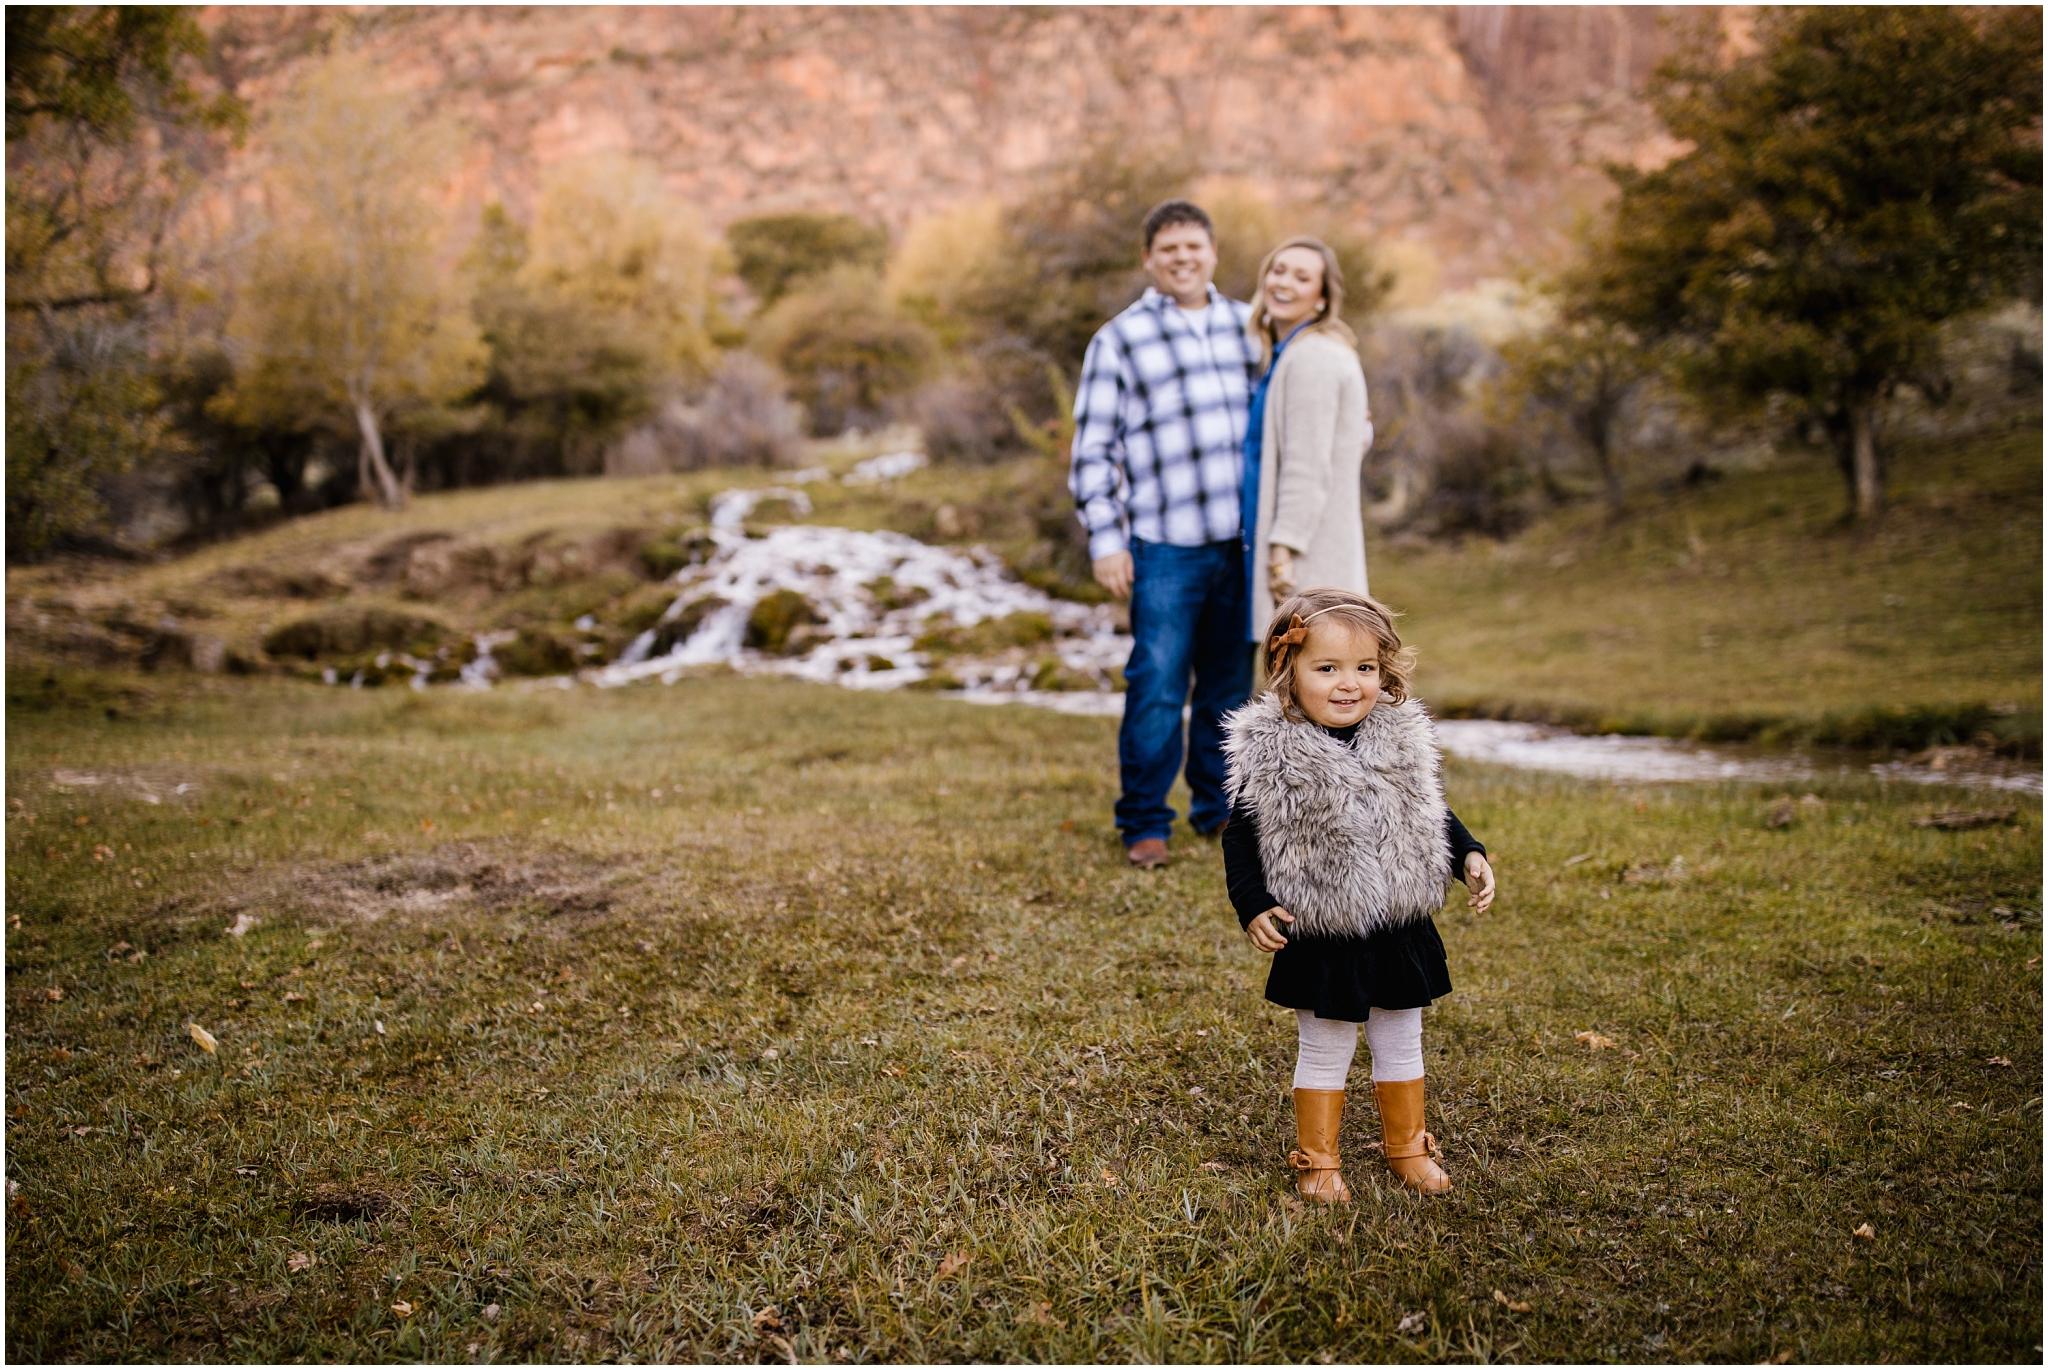 Frandsen-34_Lizzie-B-Imagery-Utah-Family-Photographer-Utah-County-Central-Utah-Park-City-Salt-Lake-City.jpg